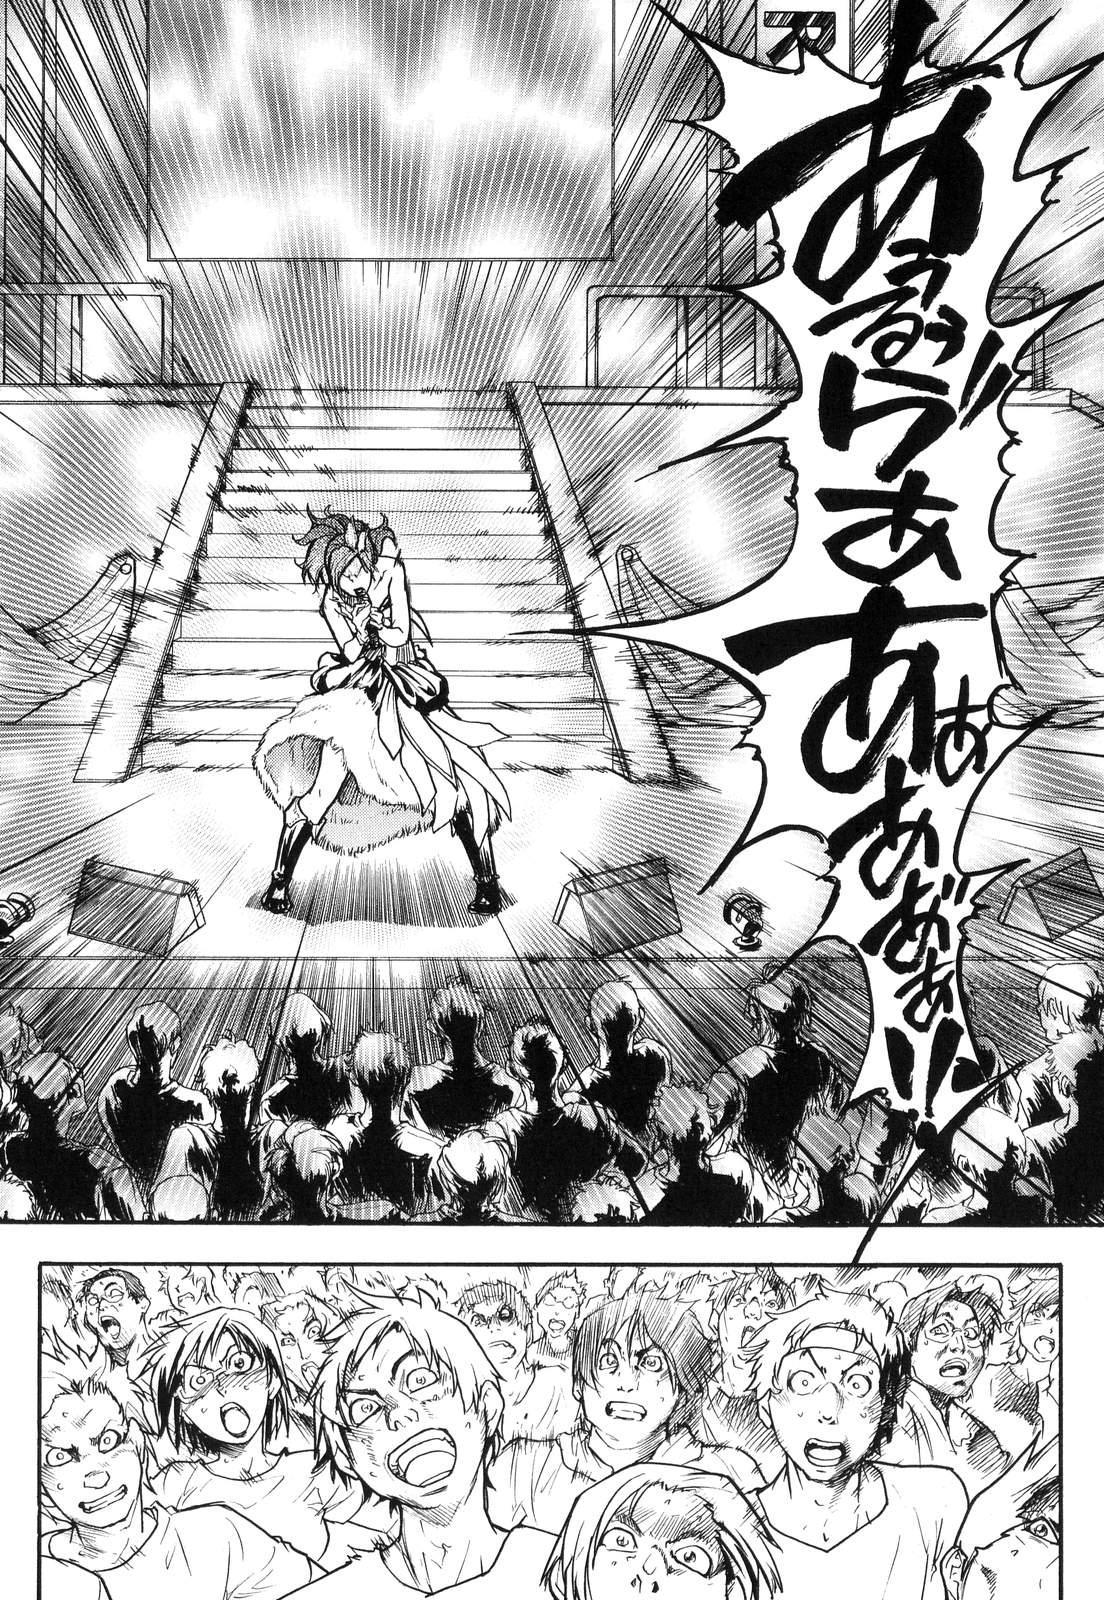 Shining Musume. 6. Rainbow Six 184